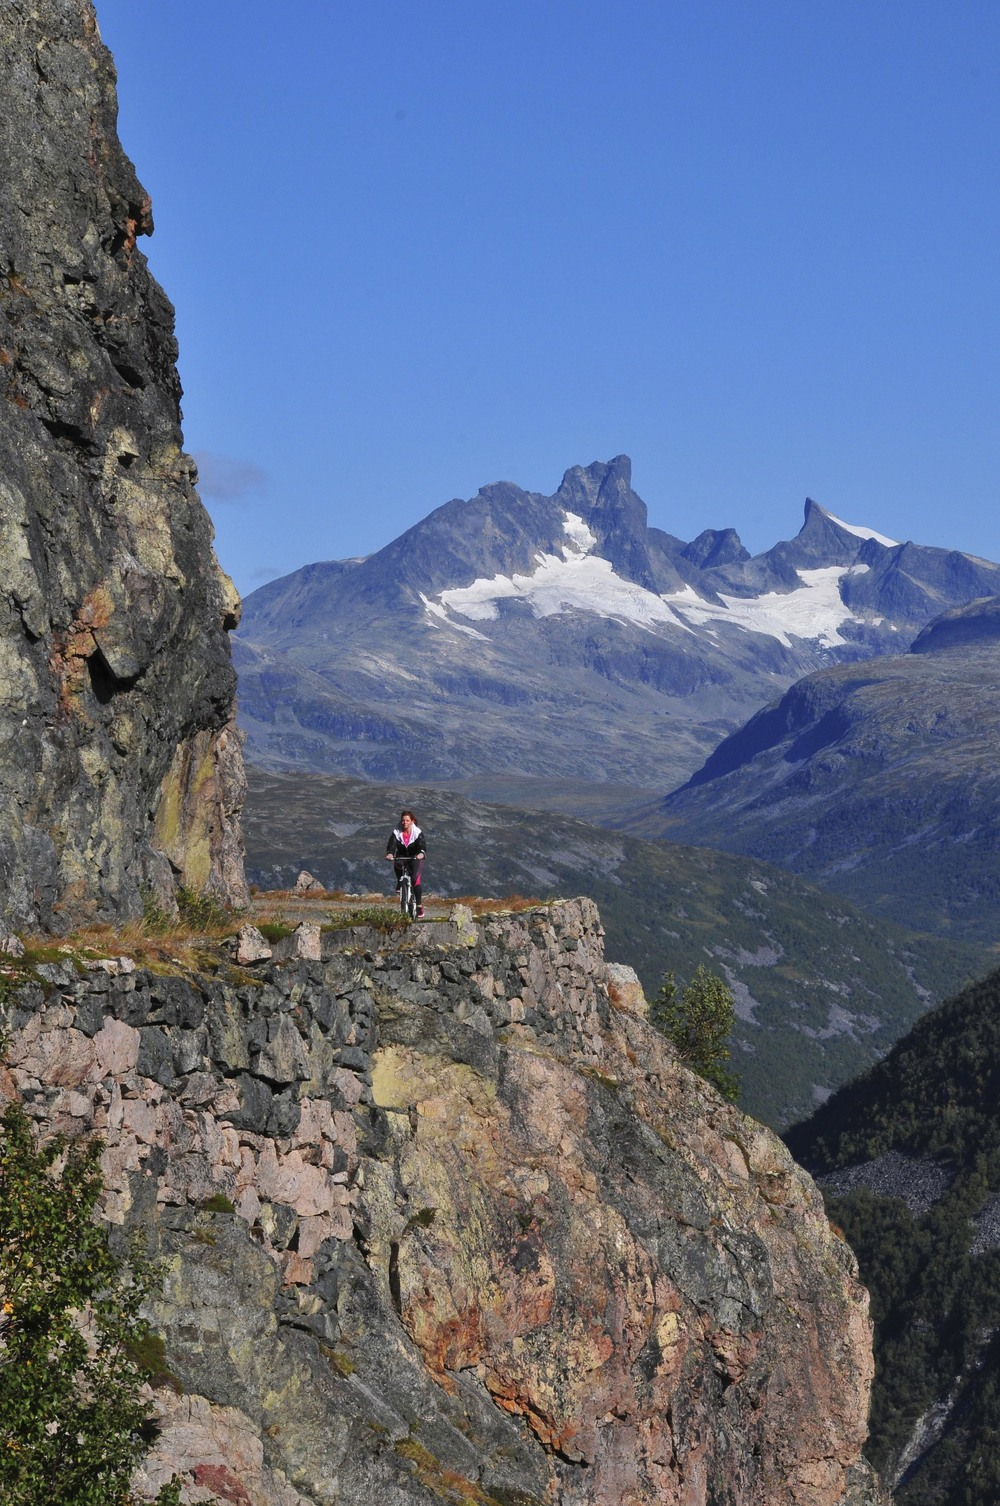 sykkeltur-Sletterust-1000-meteren+(Heirsnosi)-1.jpg